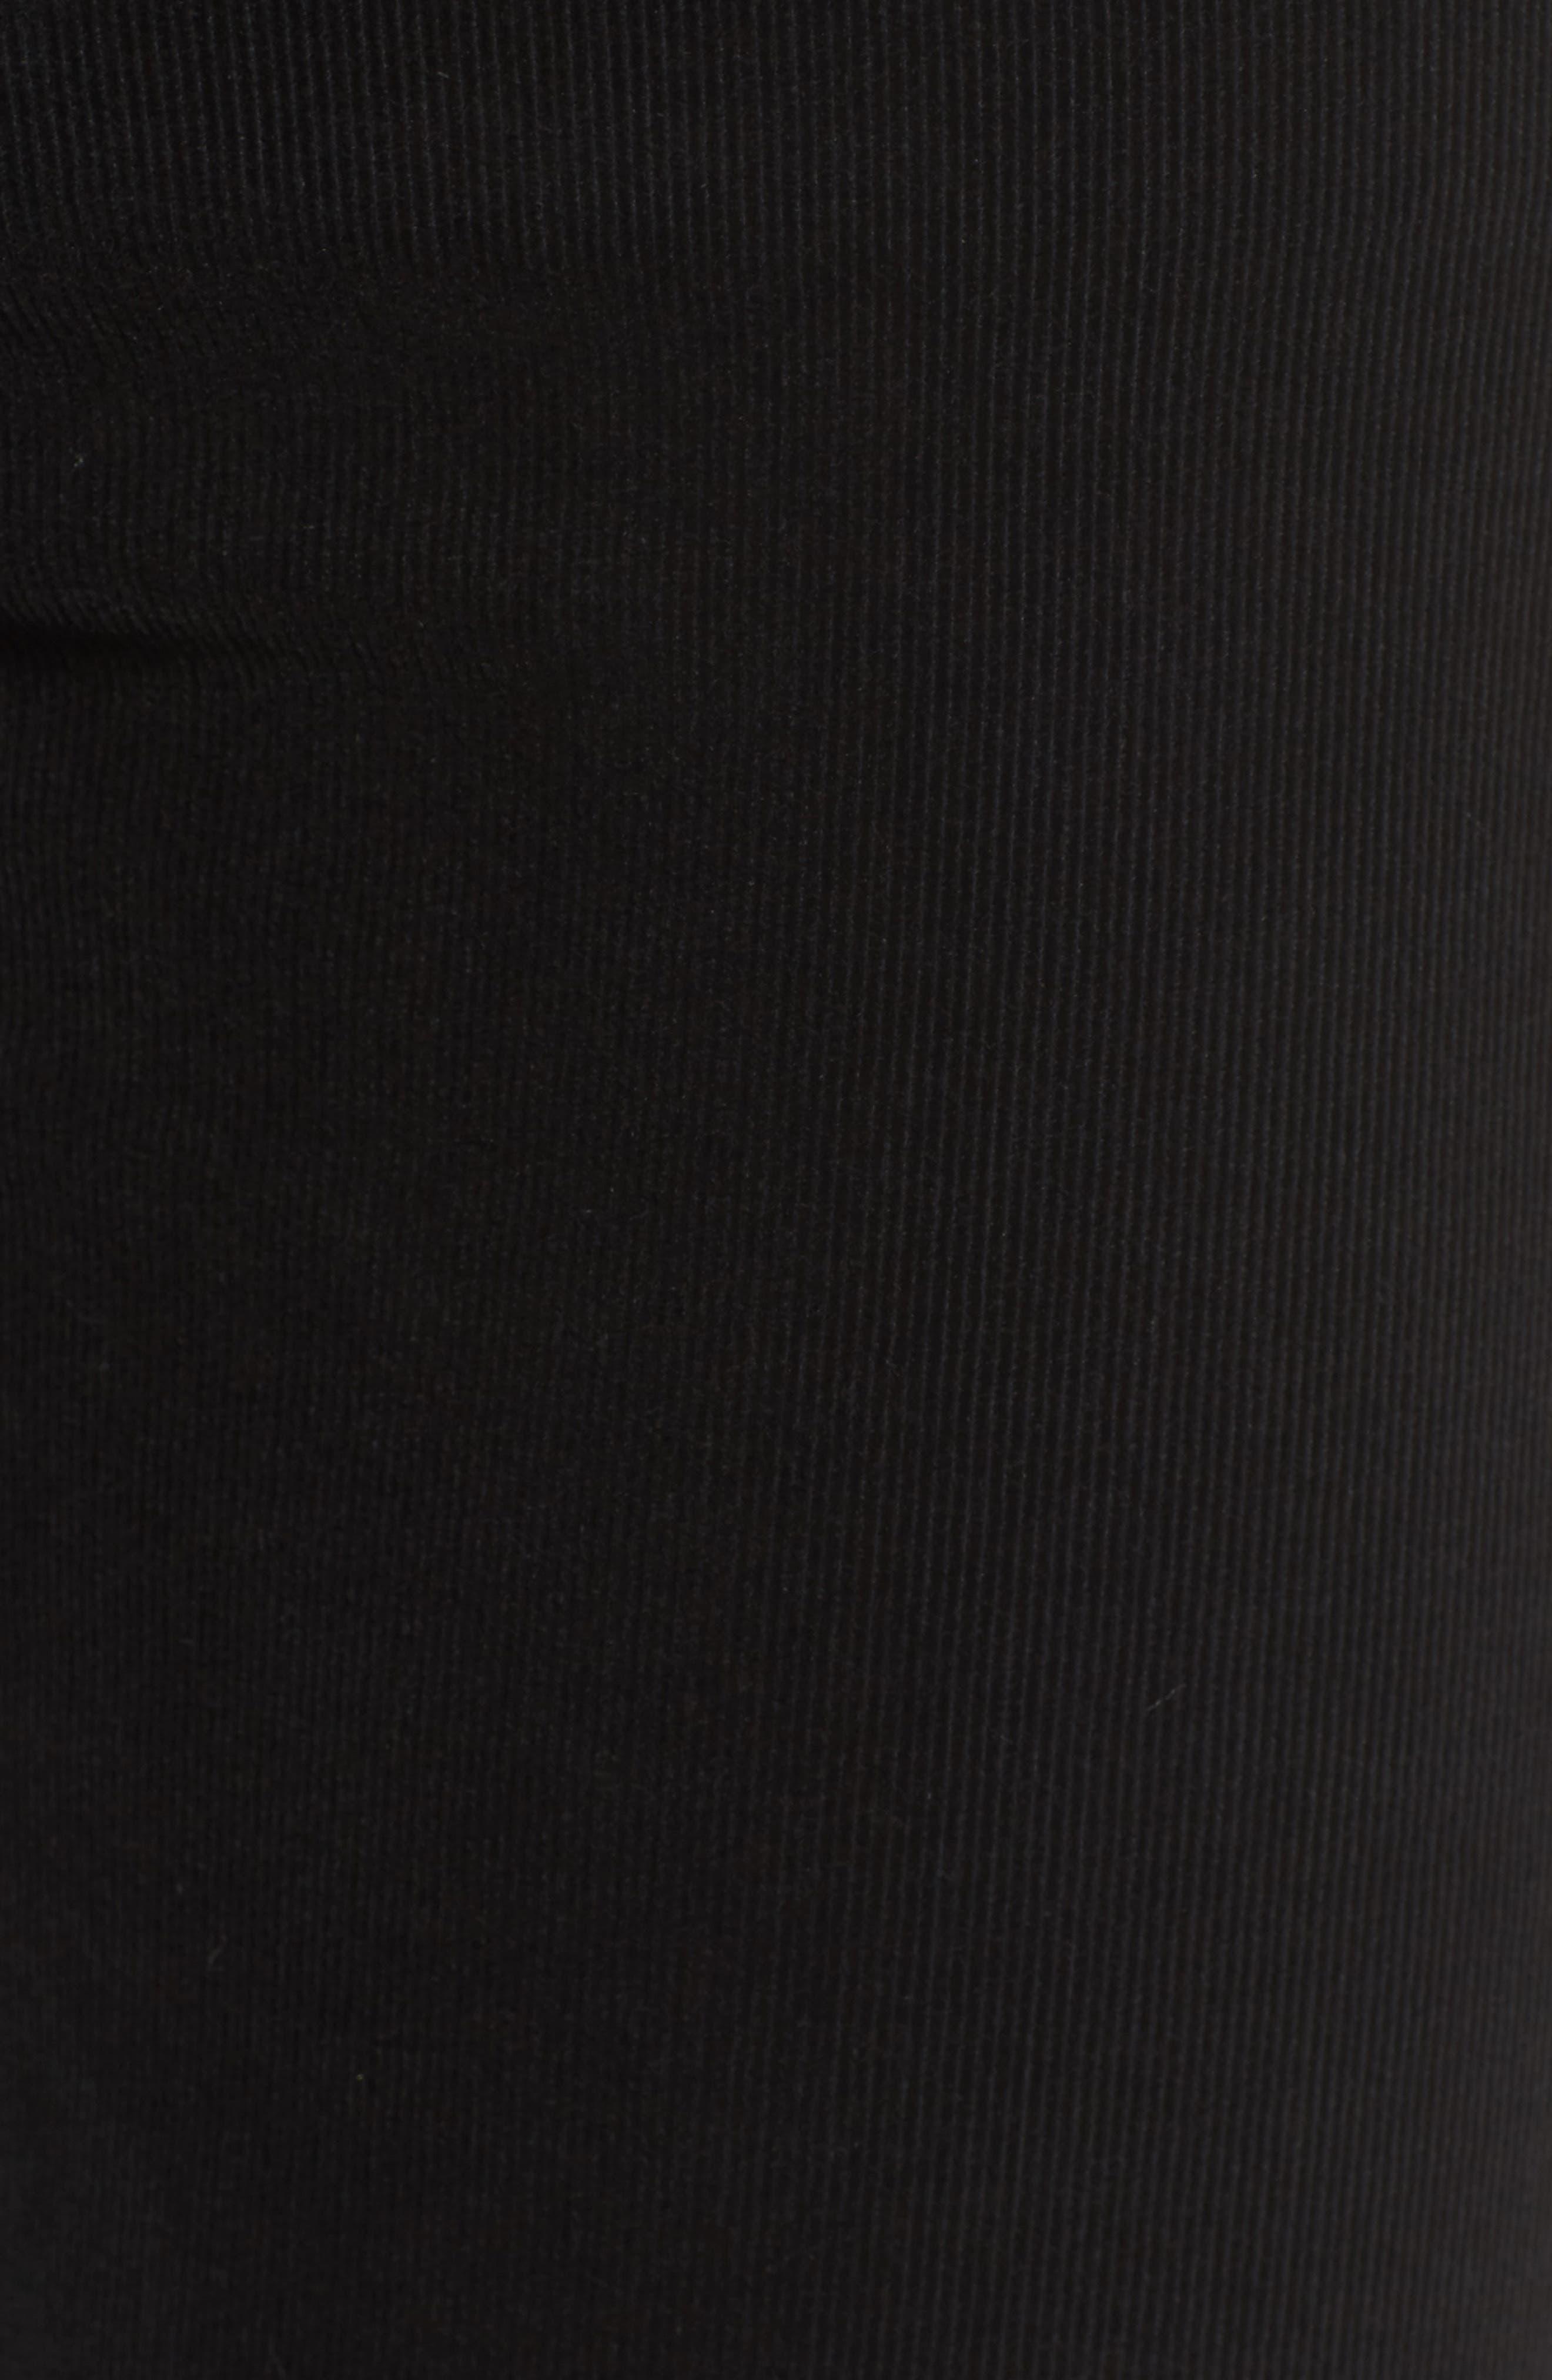 Rocket High Waist Skinny Corduroy Pants,                             Alternate thumbnail 5, color,                             006